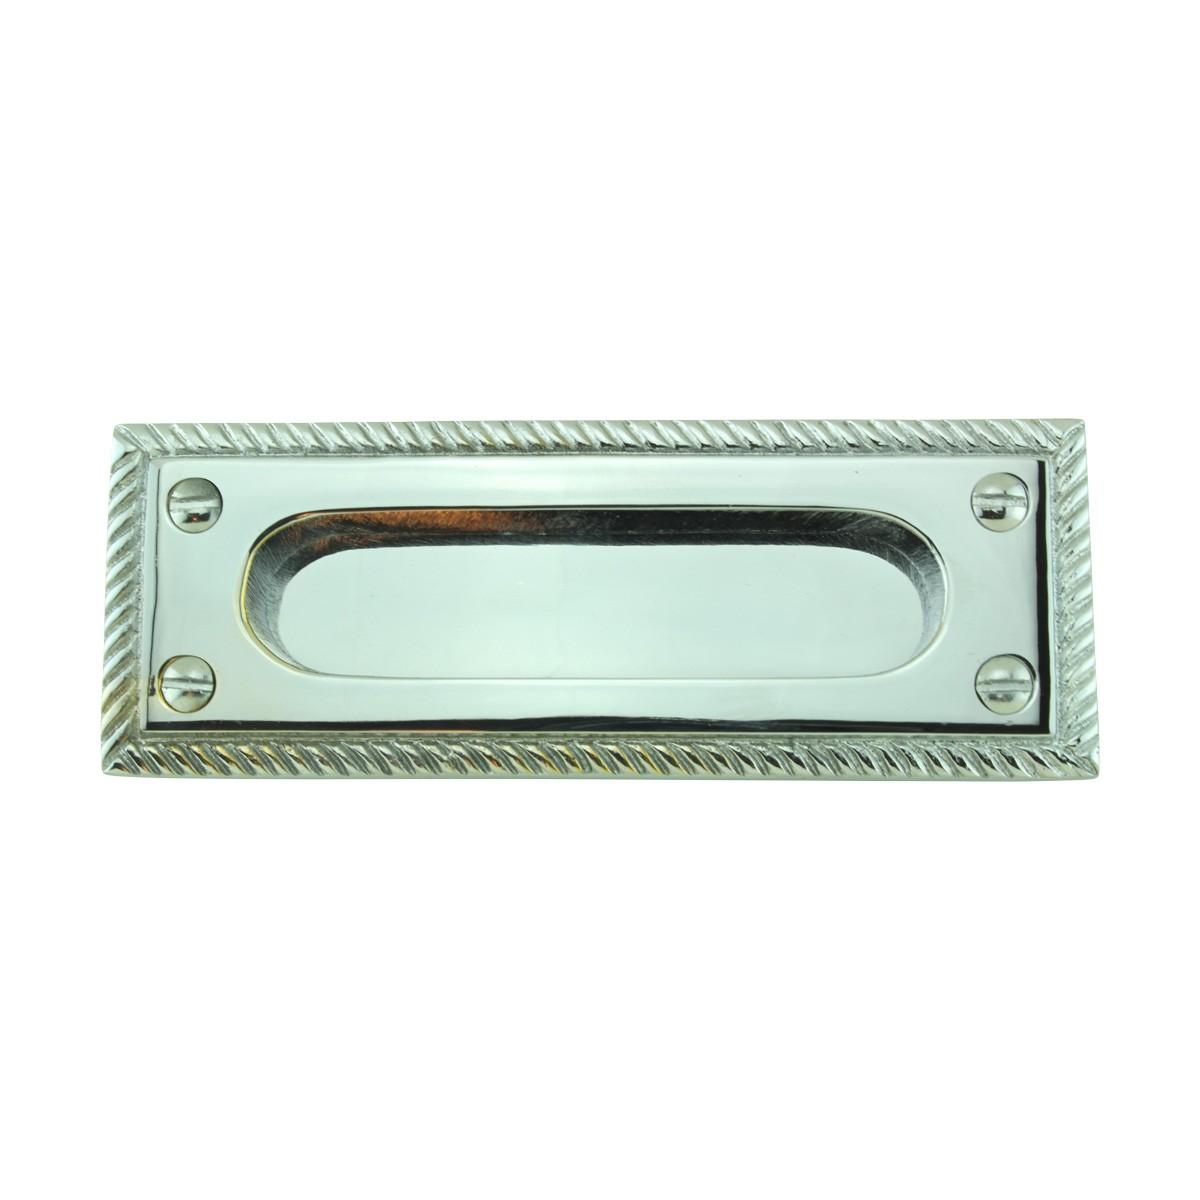 2 Georgian Rope Solid Brass Sash Lift Chrome Rectangular 5 Window Pulls Window Lifts Sash Lift